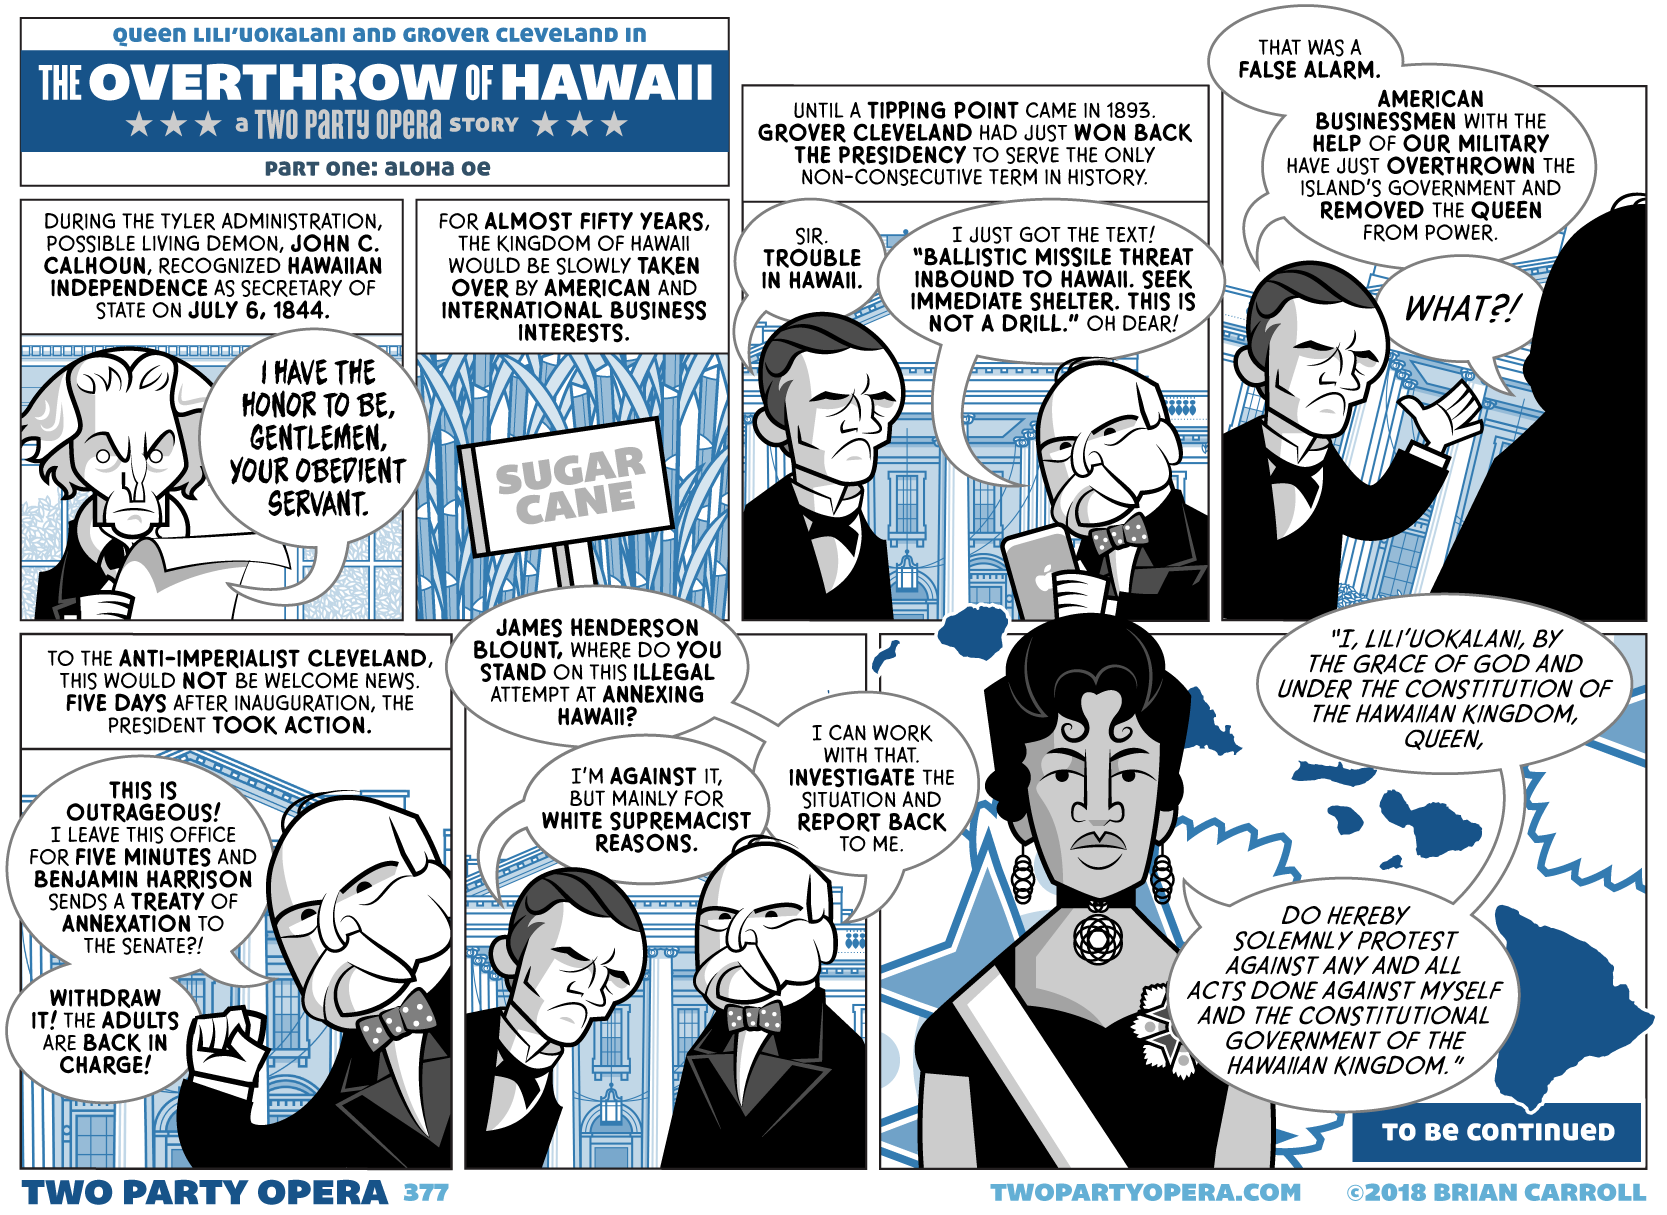 The Overthrow of Hawaii – Part One: Aloha Oe